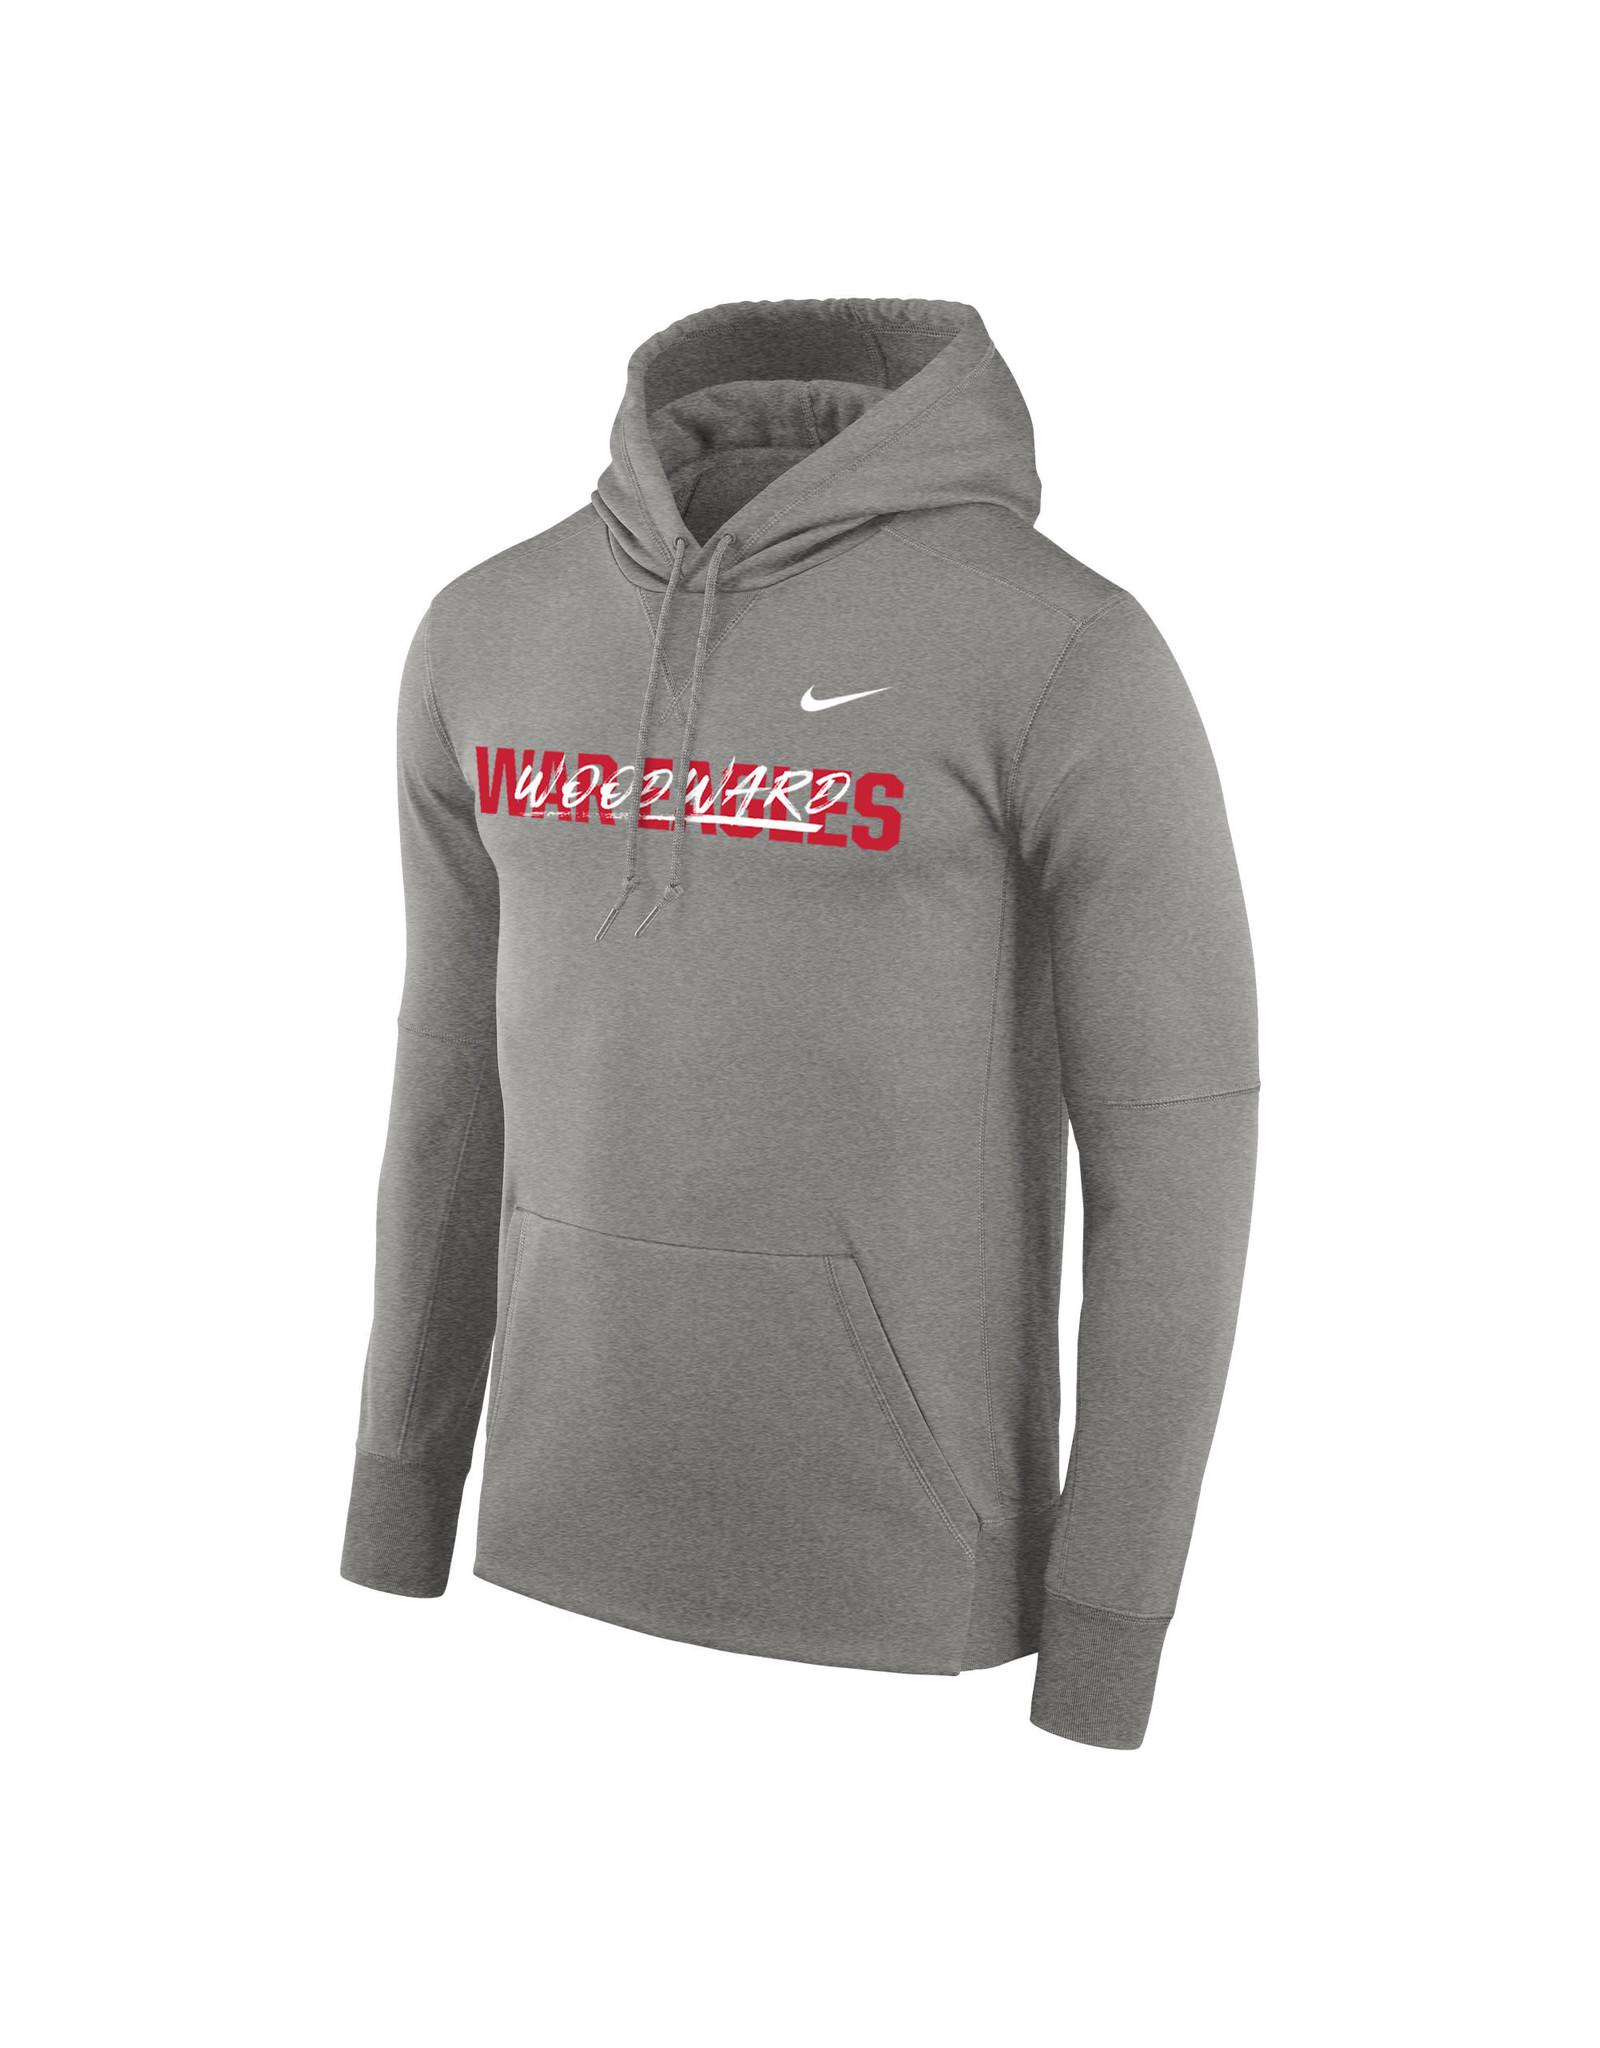 NIKE Therma PO Hooded Sweatshirt in Dark Heather